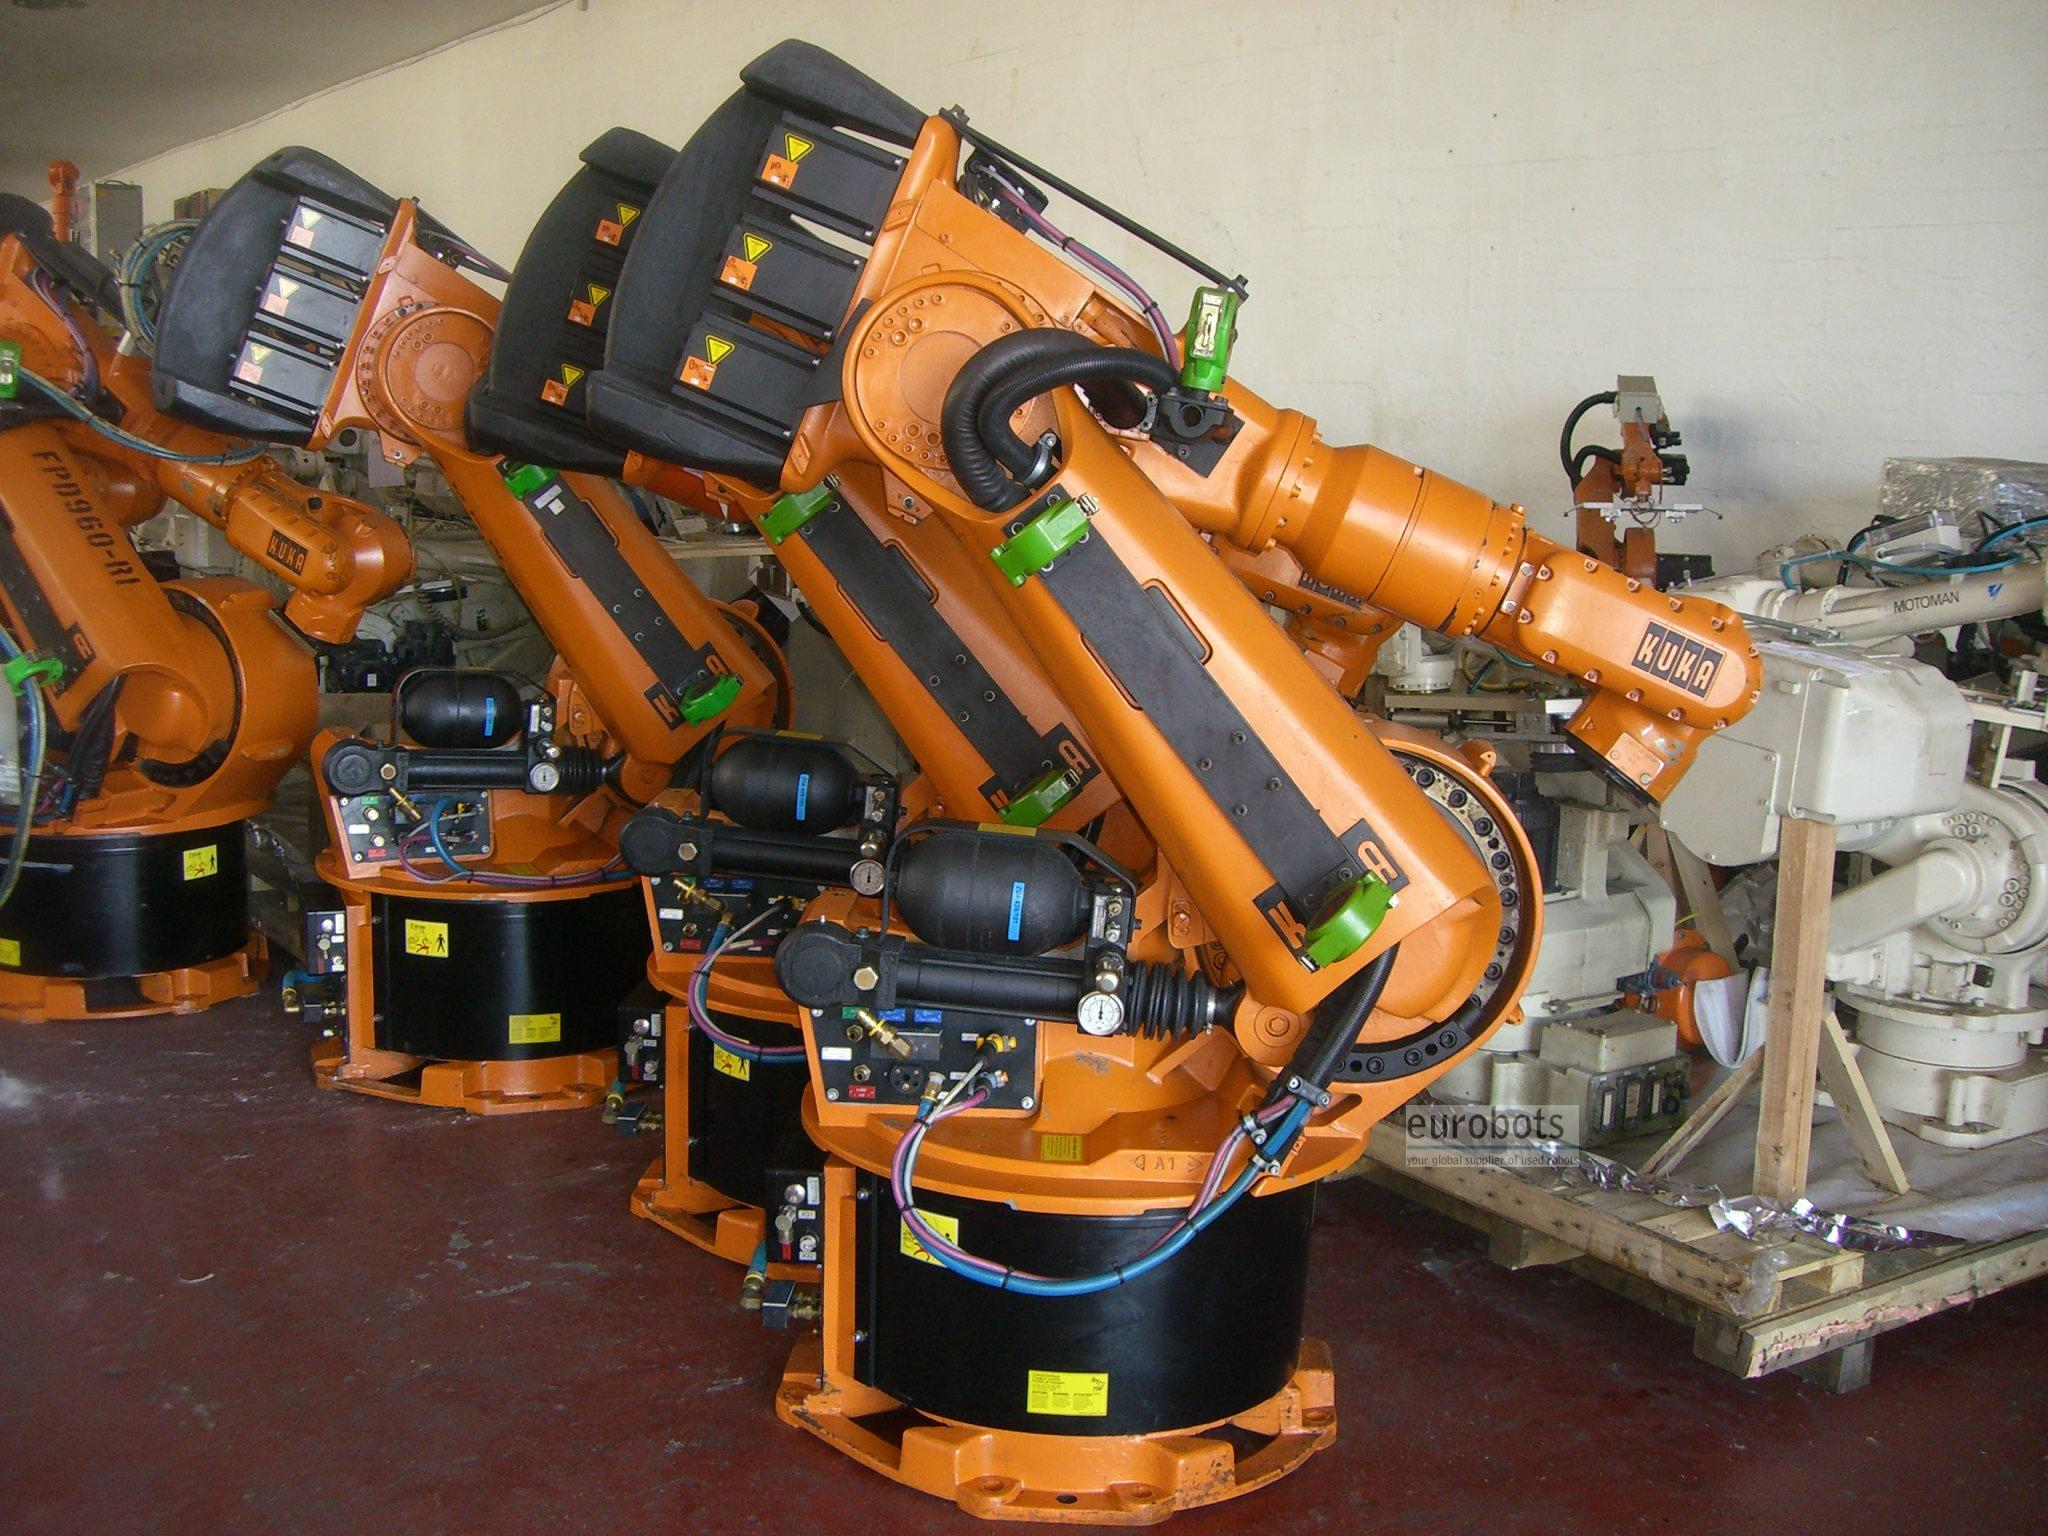 Kuka Kr150 125 200 Used Robot With Krc2 Eurobots